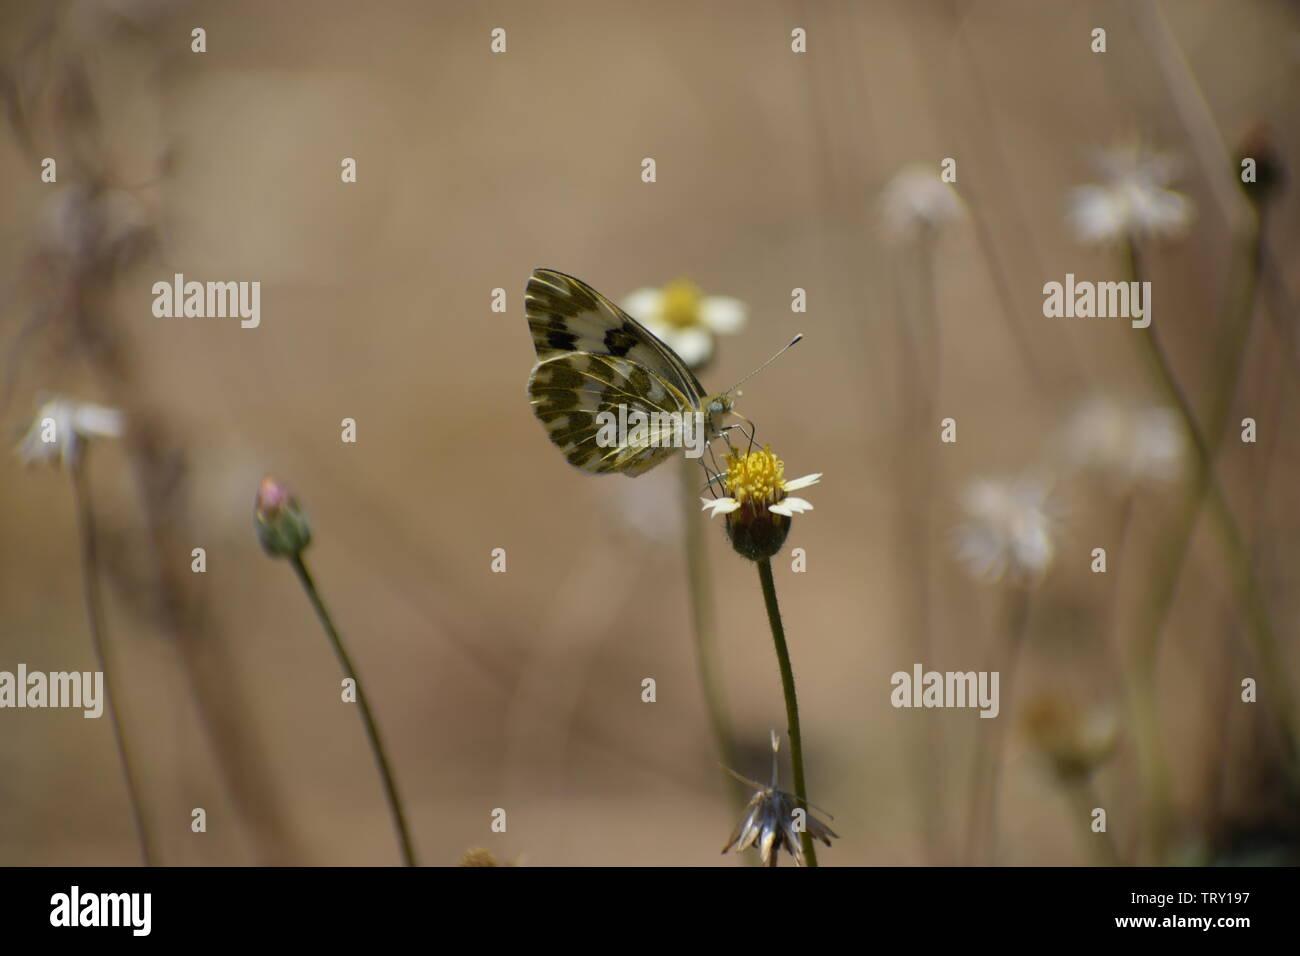 Bel bagno bianco (pontia daplidice) farfalla. Immagini Stock